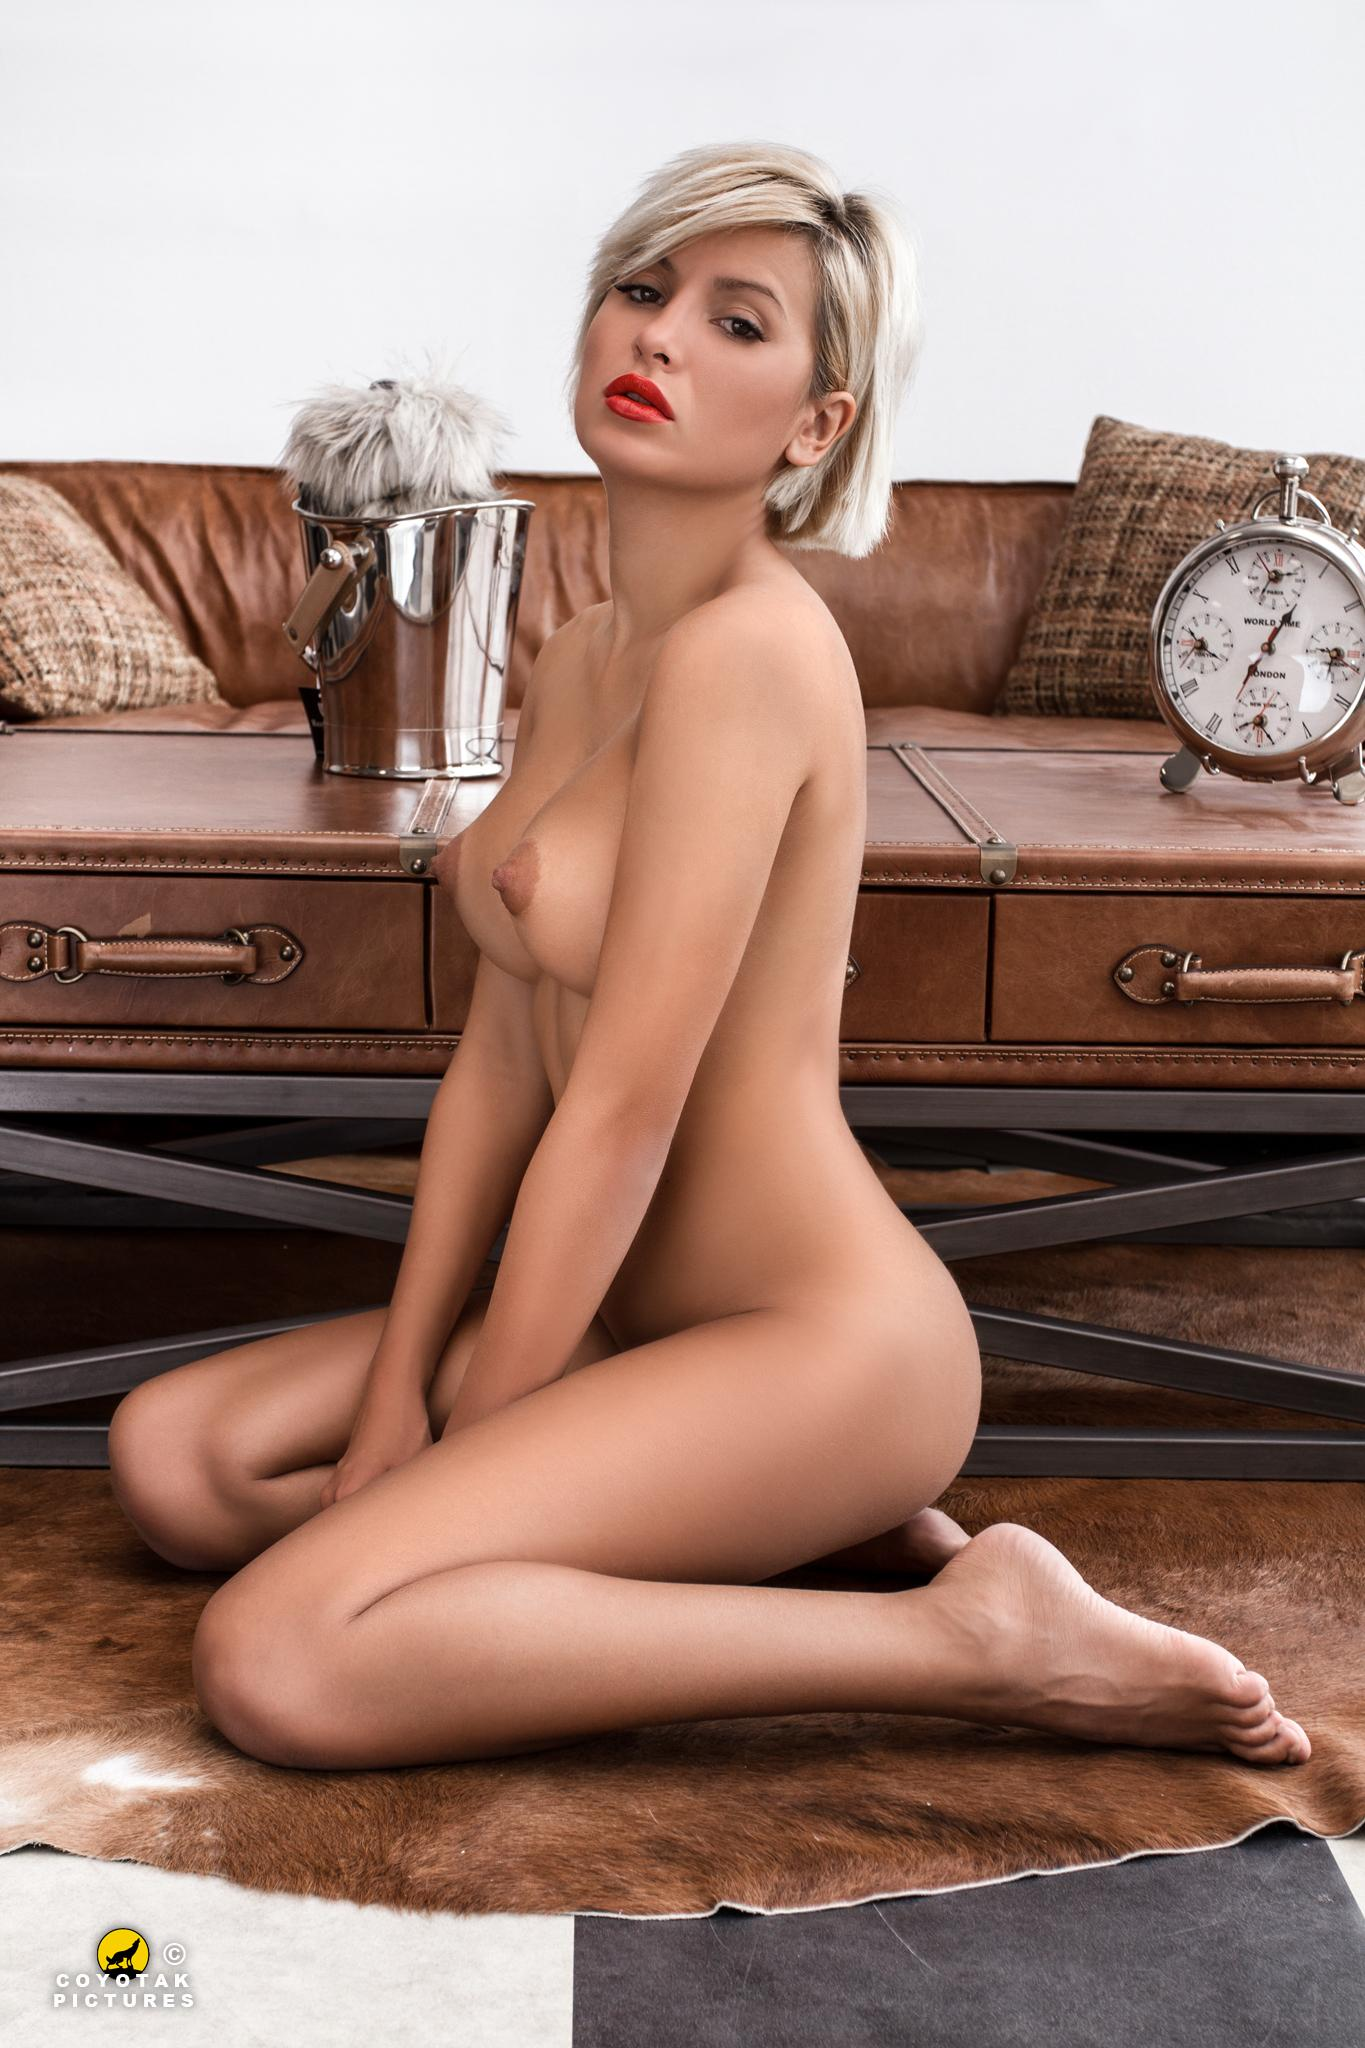 Playboy Playboy Slovakia - Petra Mariia / Coyot Coyotak